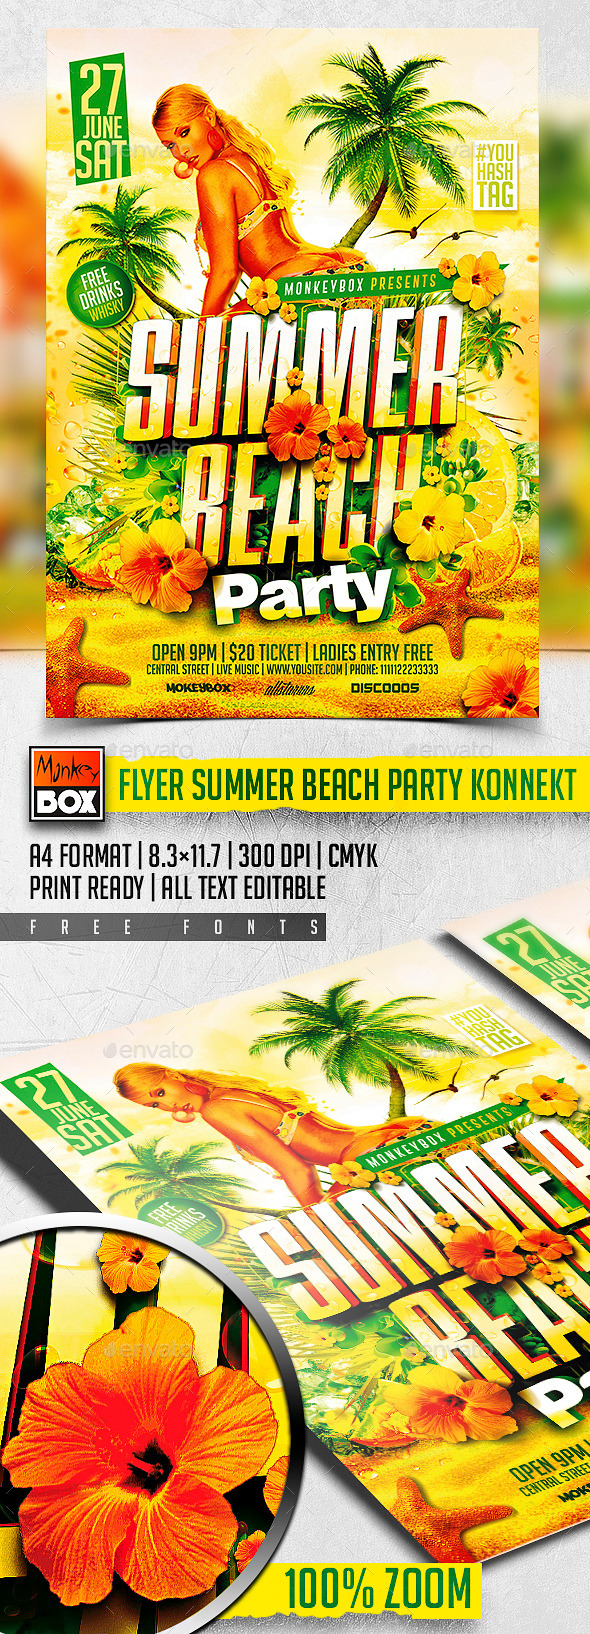 GraphicRiver Flyer Summer Beach Party Konnekt 11424509